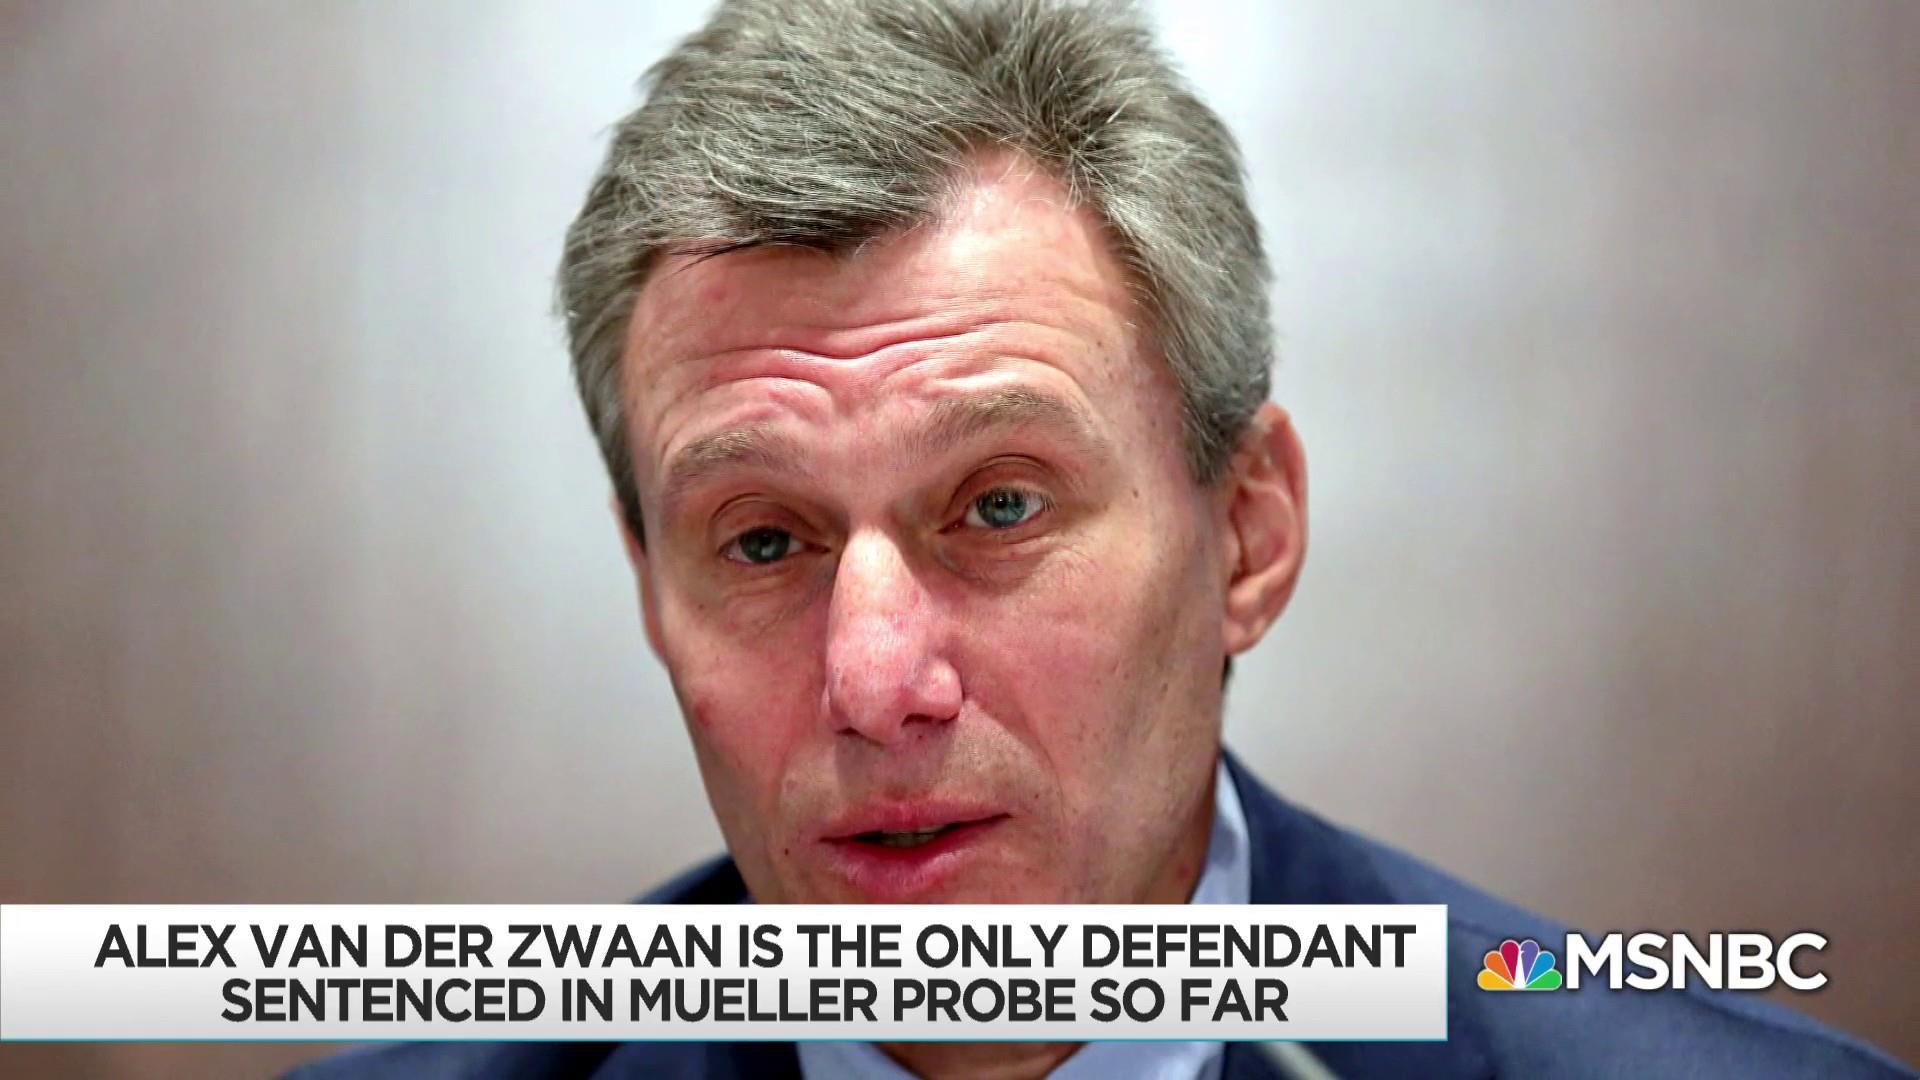 Russia's Alfa Bank fails in lawsuit over Steele's Trump dossier